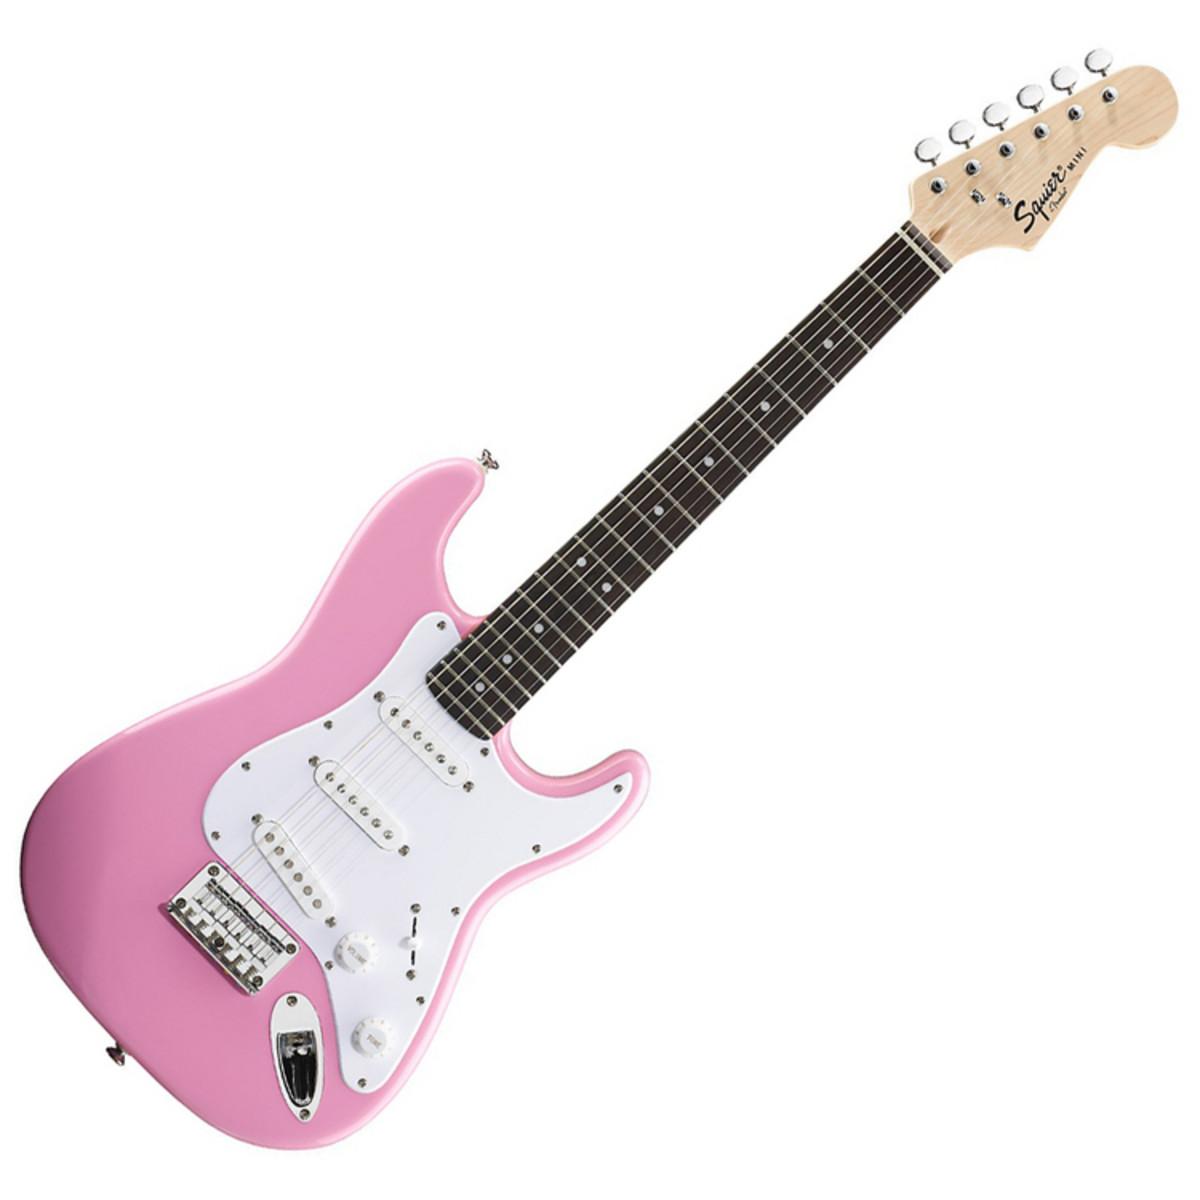 squier fender mini stratocaster 3 4 taille guitare. Black Bedroom Furniture Sets. Home Design Ideas